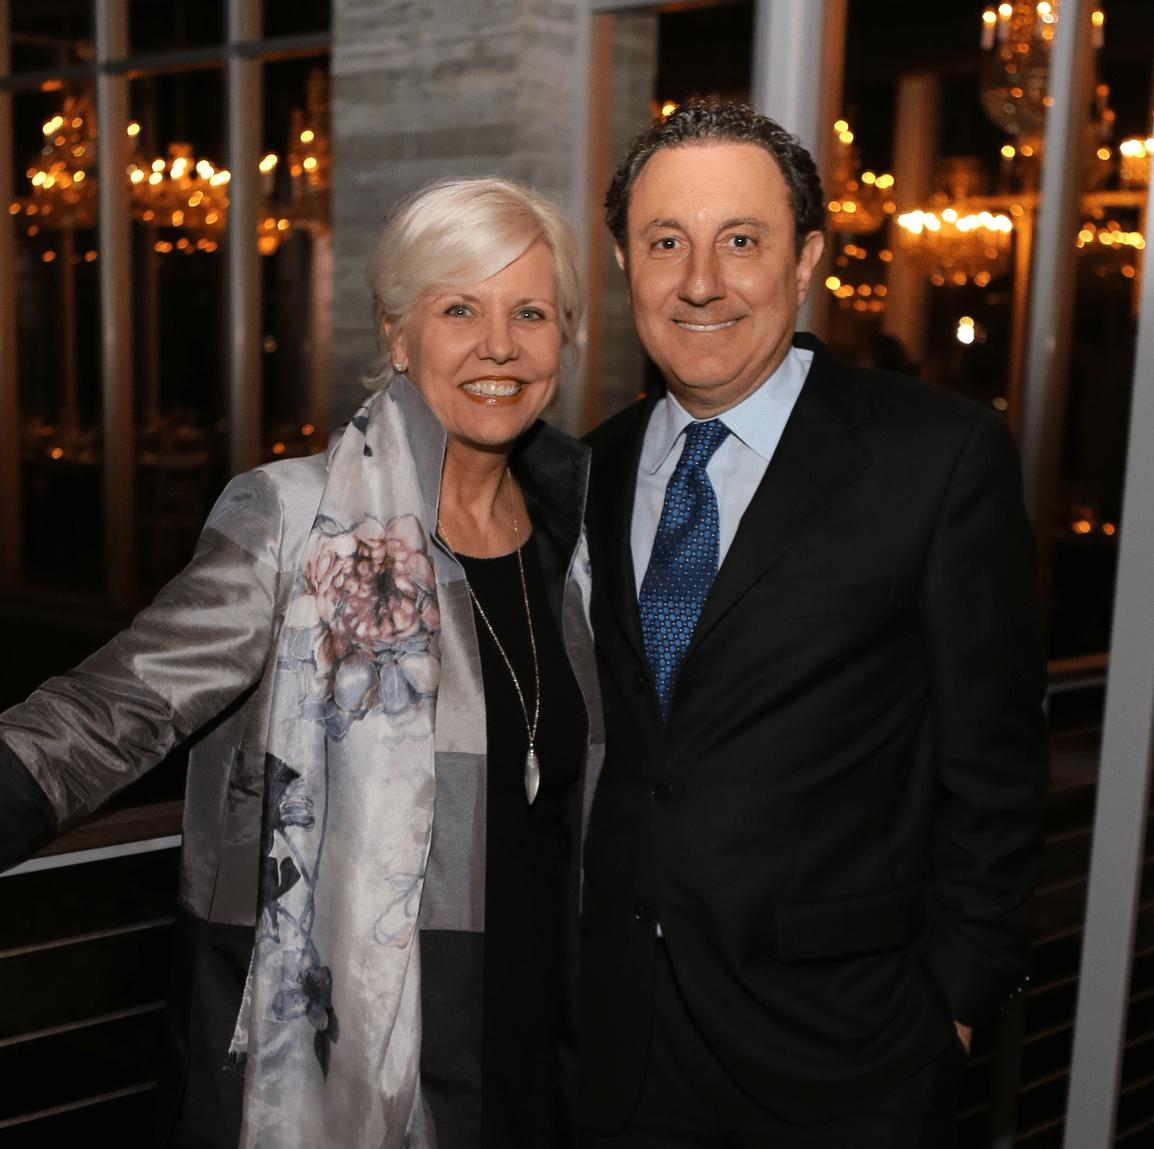 News, Equinox Opening Dinner, Dec. 2015, Sallie Sargent, Tom Ajamie